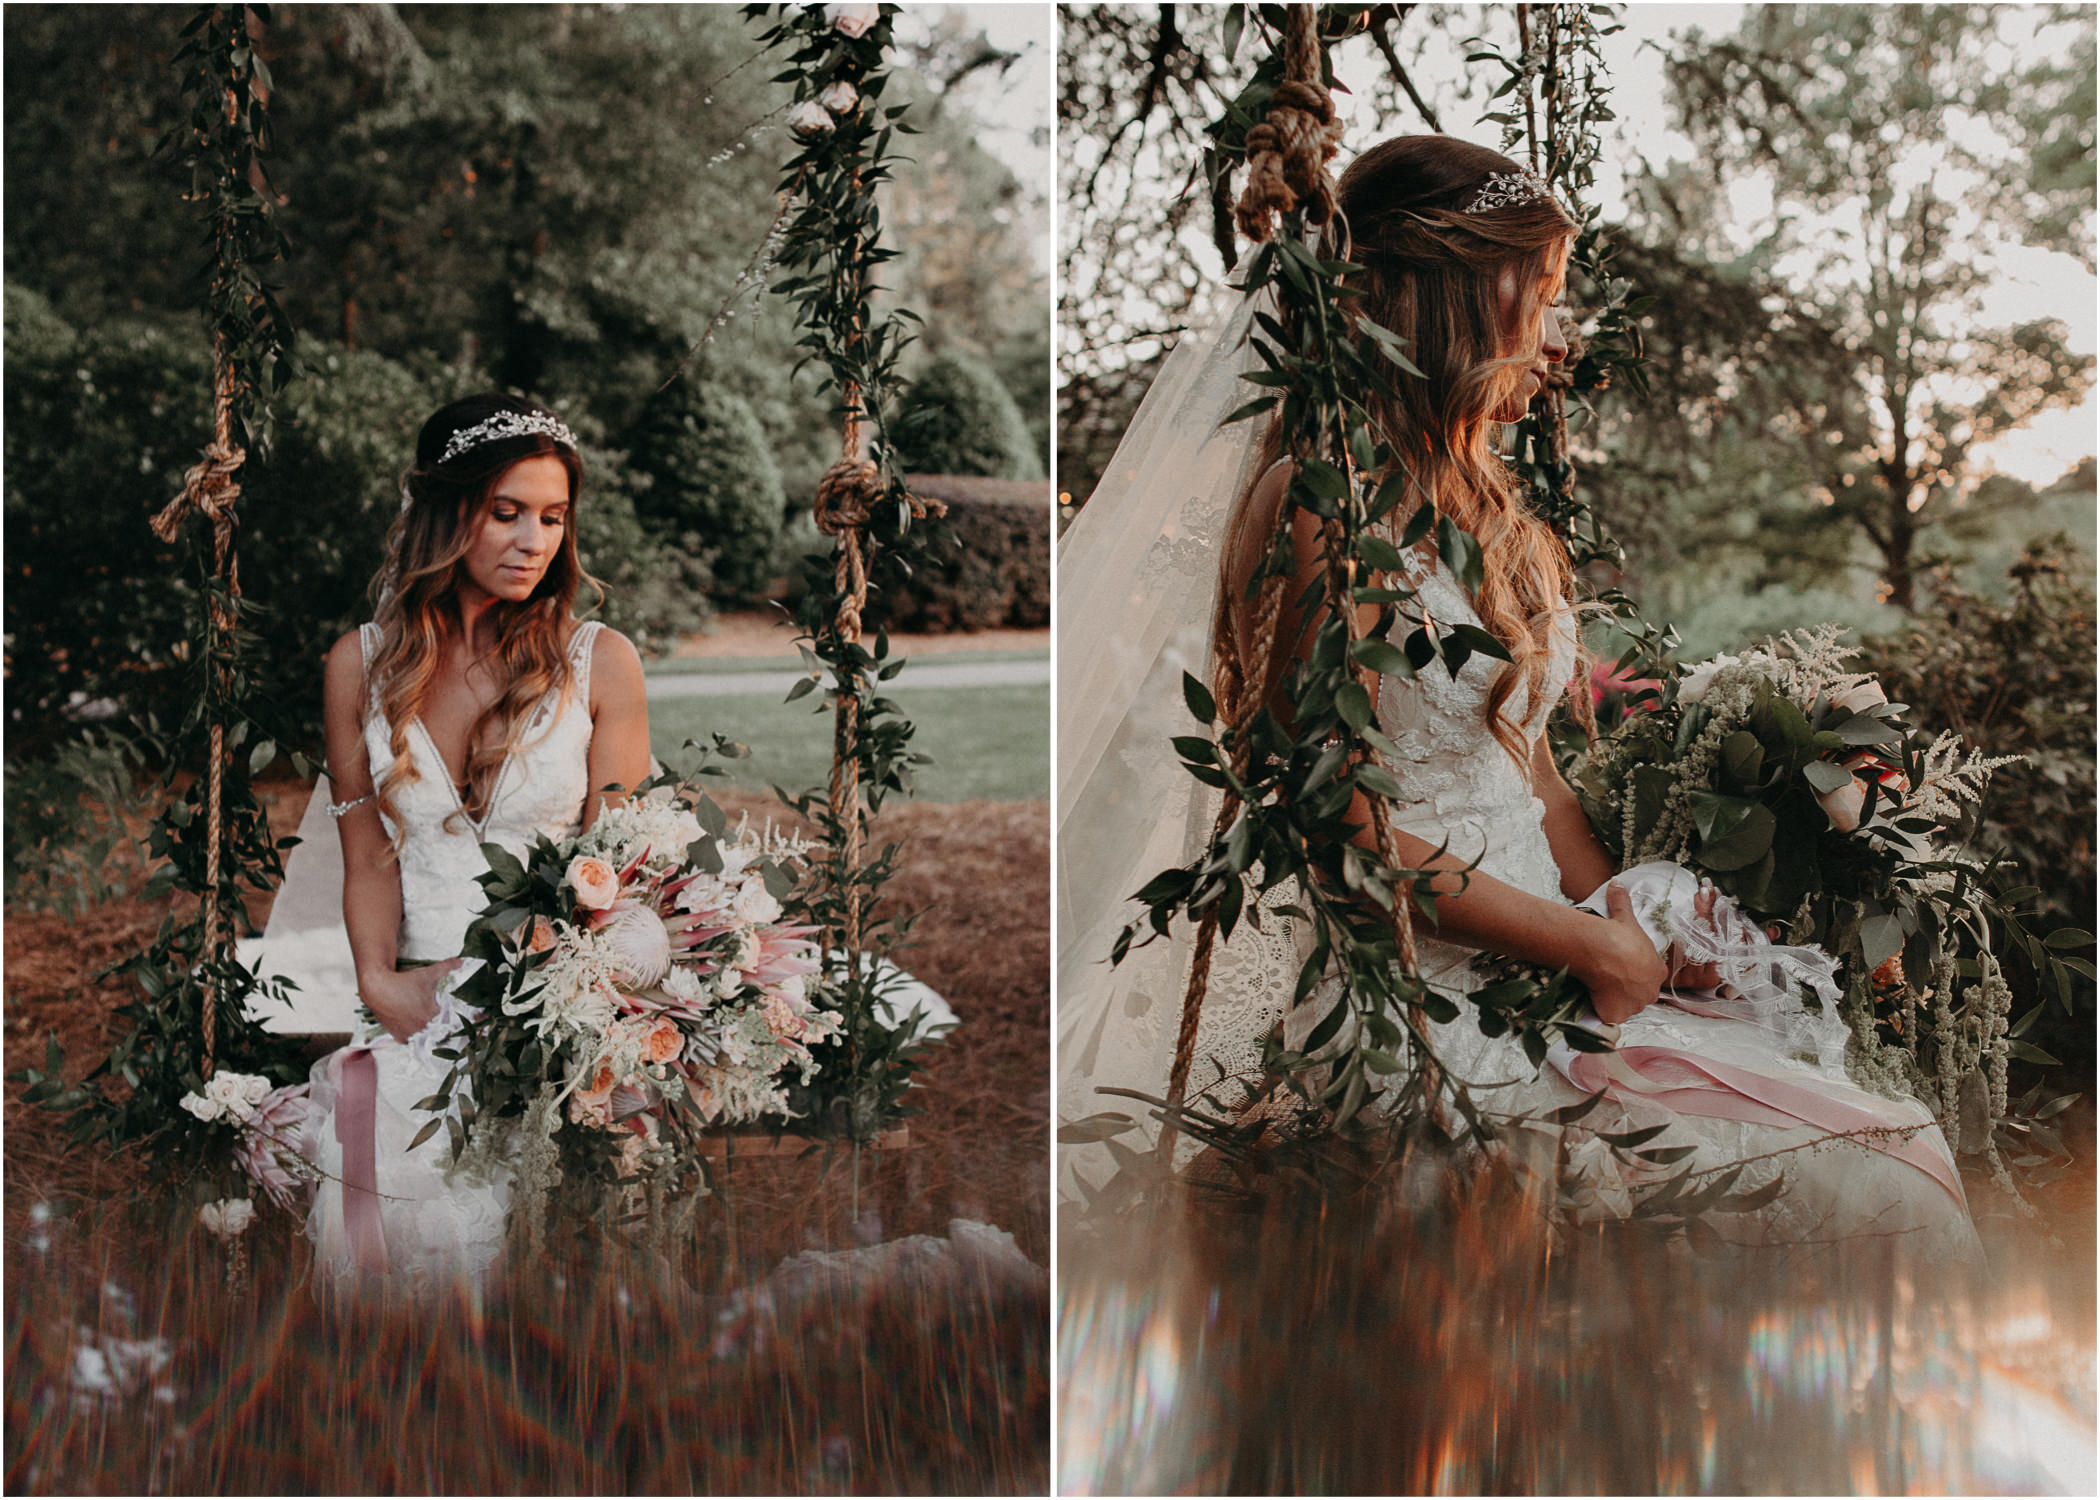 83Carl House Wedding Venue Ga, Atlanta Wedding Photographer - Boho, Bohemian, Junebug Weddings, Vintage, Retro, Trendy. Aline Marin Photography. .jpg